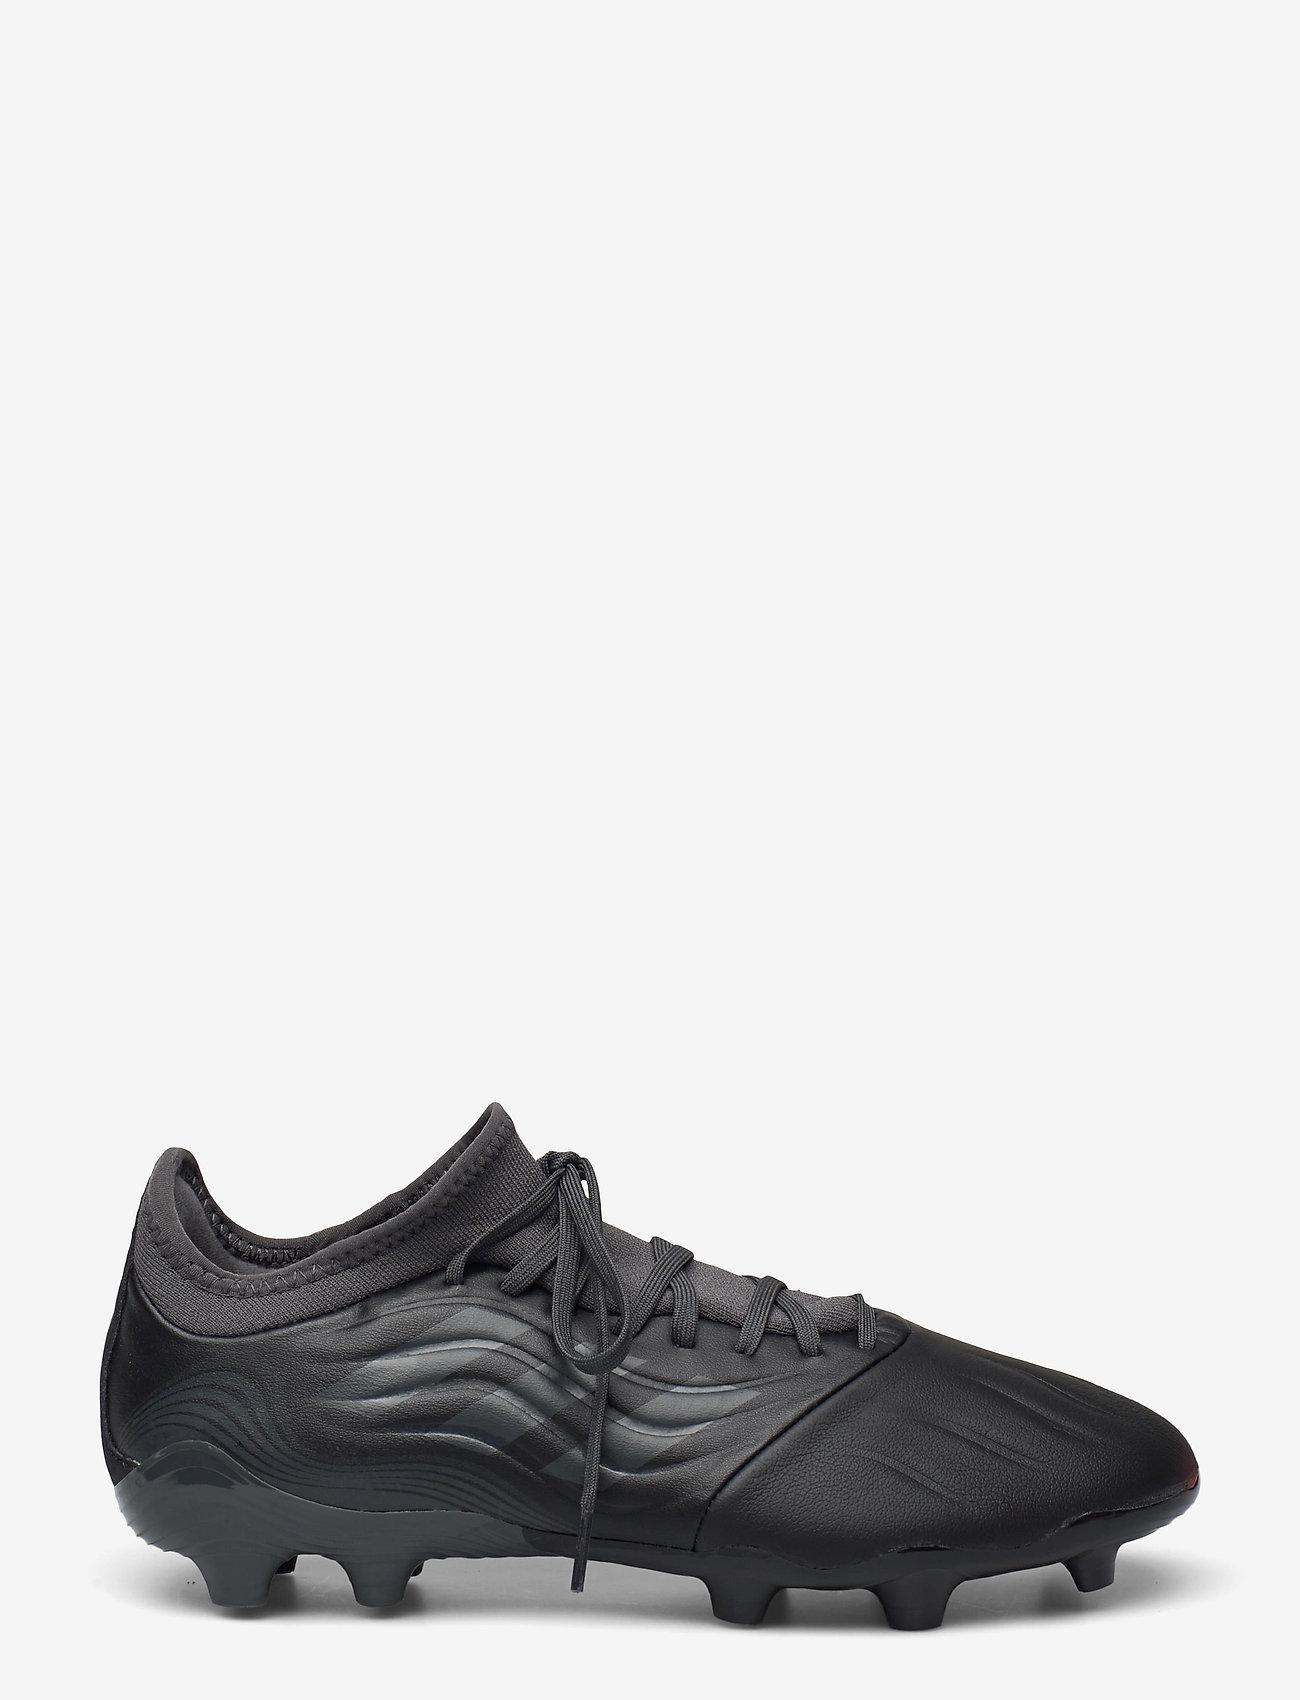 adidas Performance - Copa Sense.3 Firm Ground Boots - fotballsko - cblack/gresix/gresix - 1